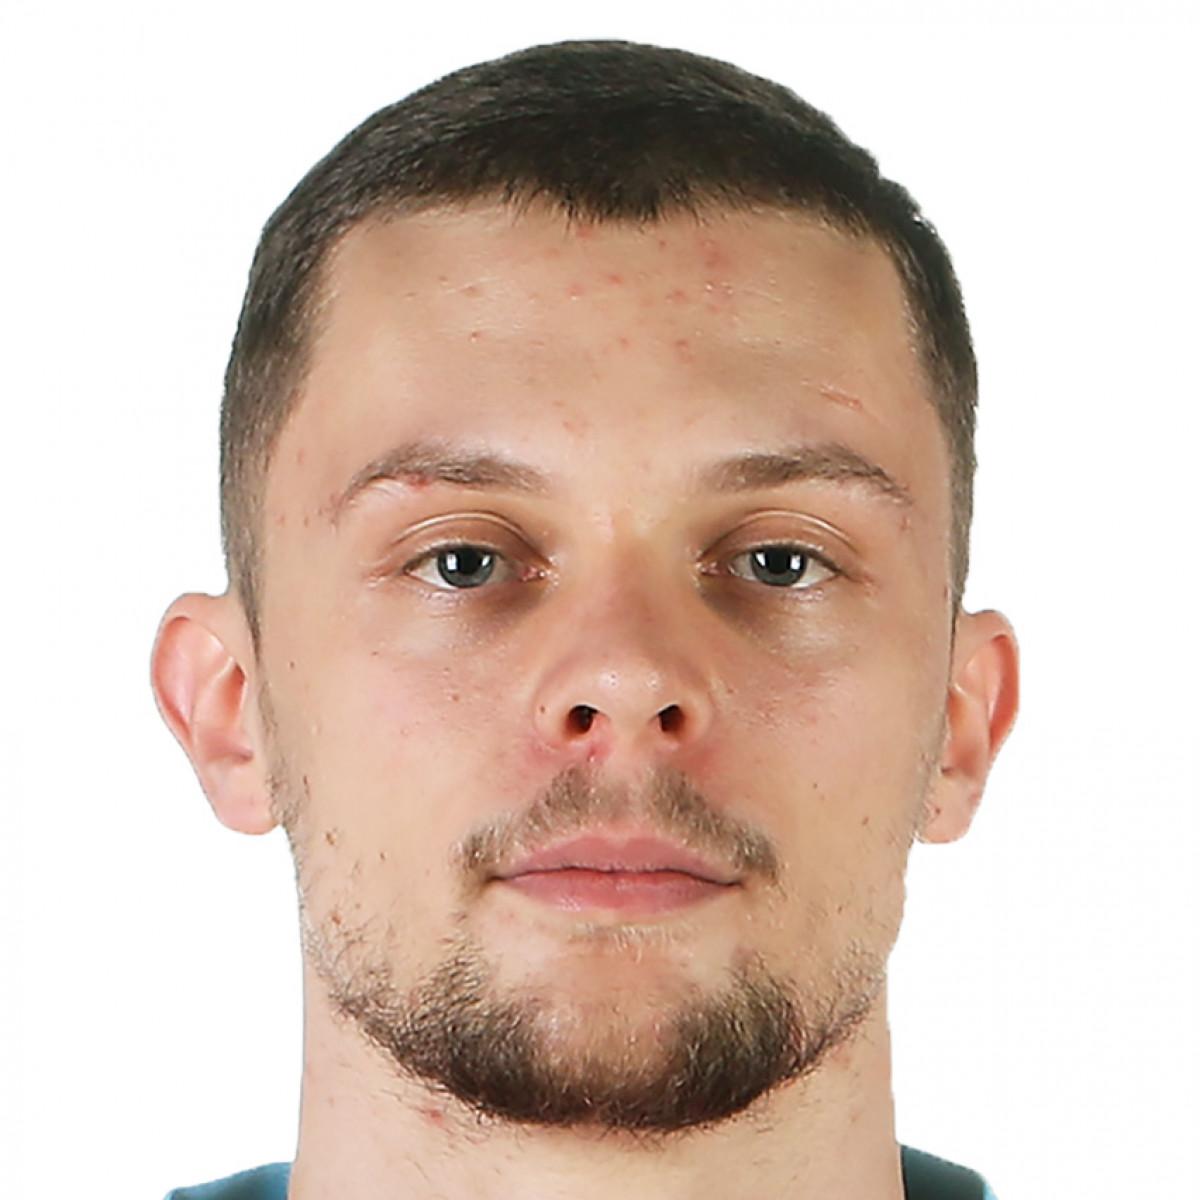 Andrija   Marjanovic